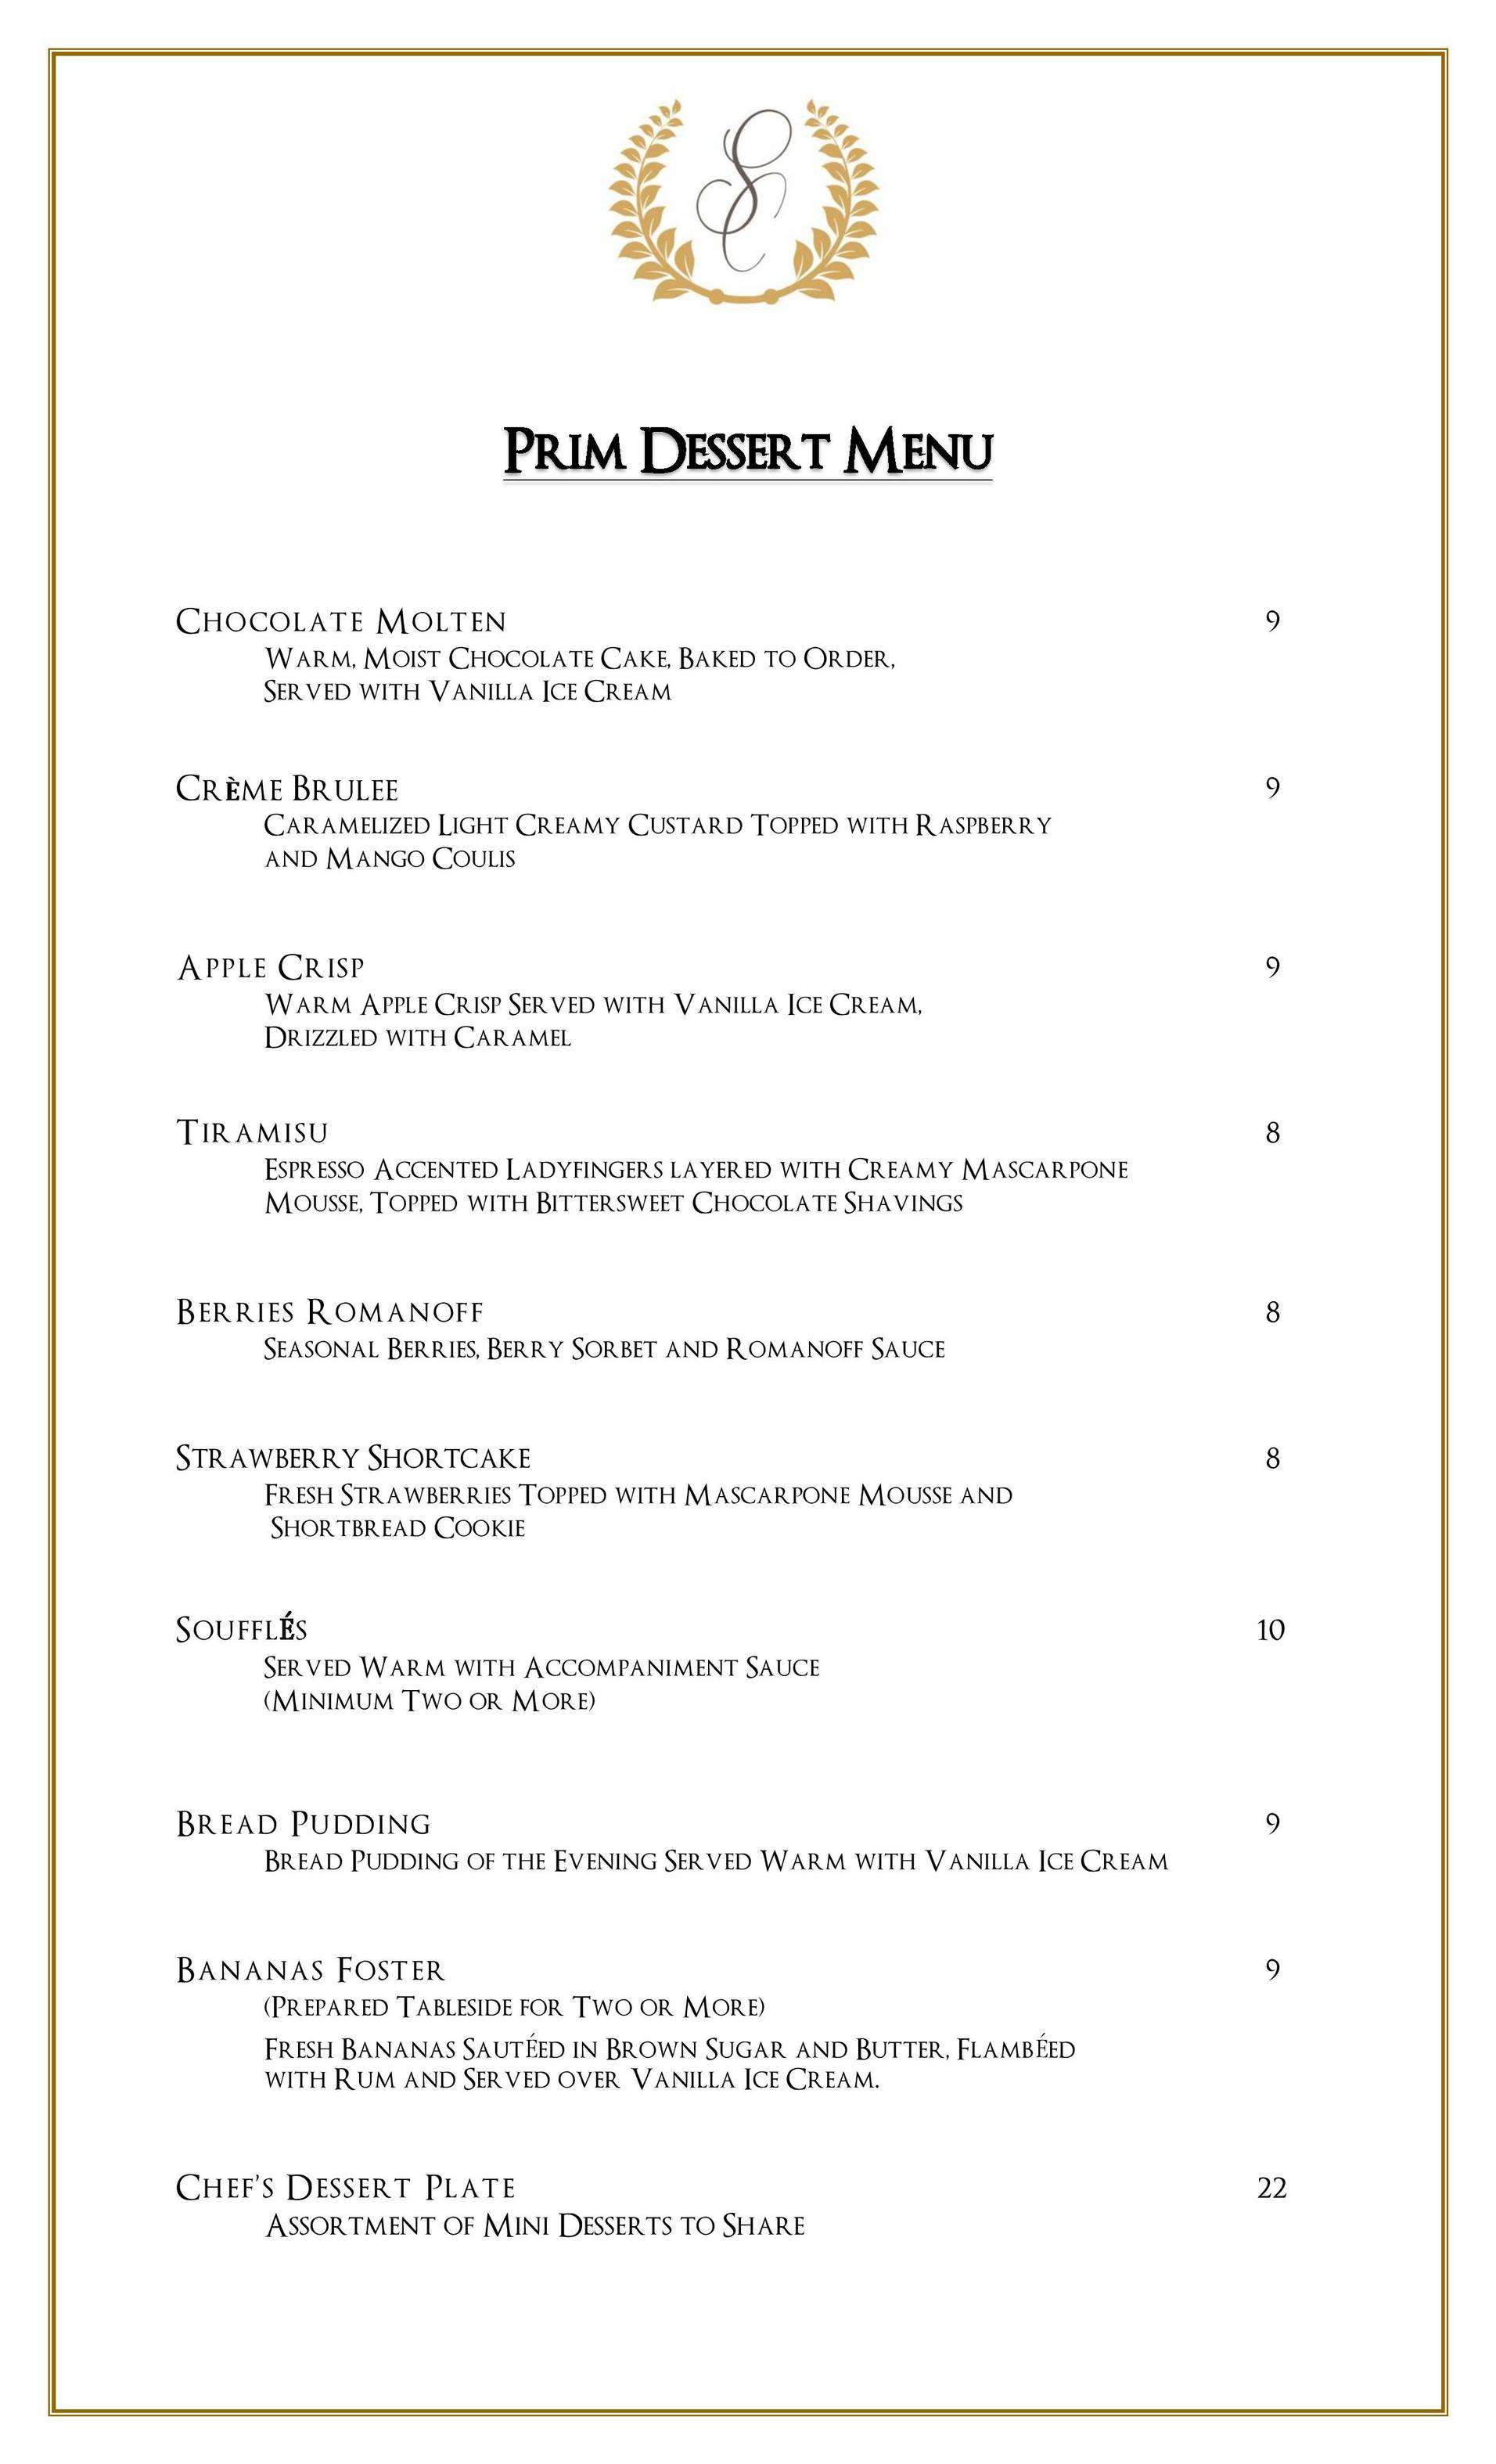 Prim Dessert-menu-page-001_tn